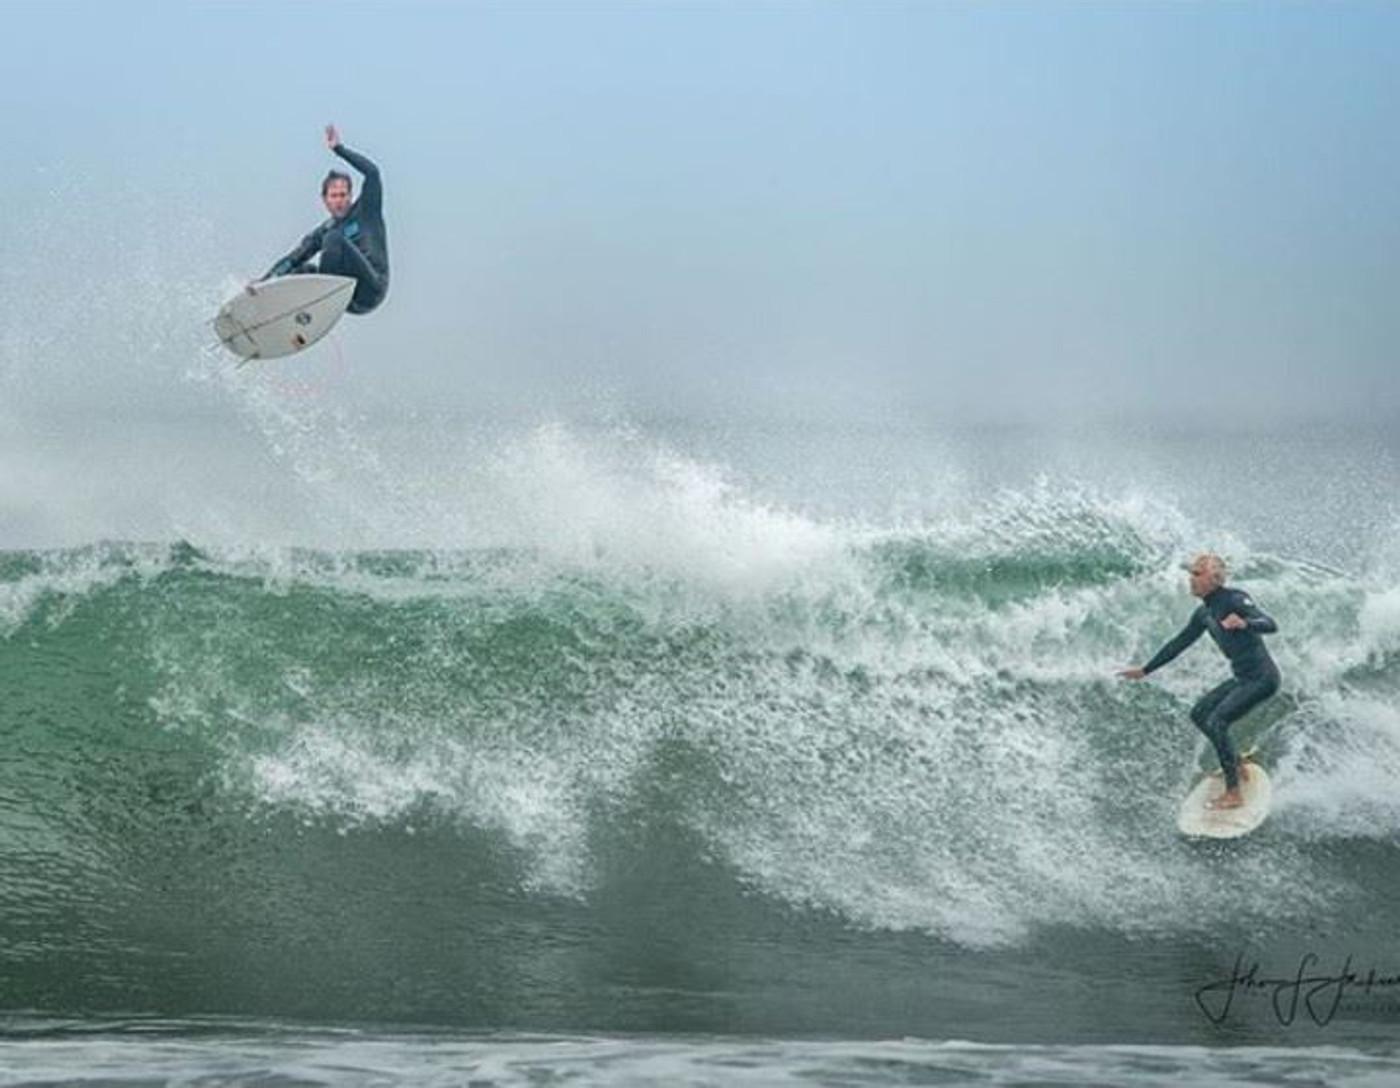 Ryan Turner flying above Huntington Beach - using our signature Lunasurf thruster fin. Pic Johnjksn Photography